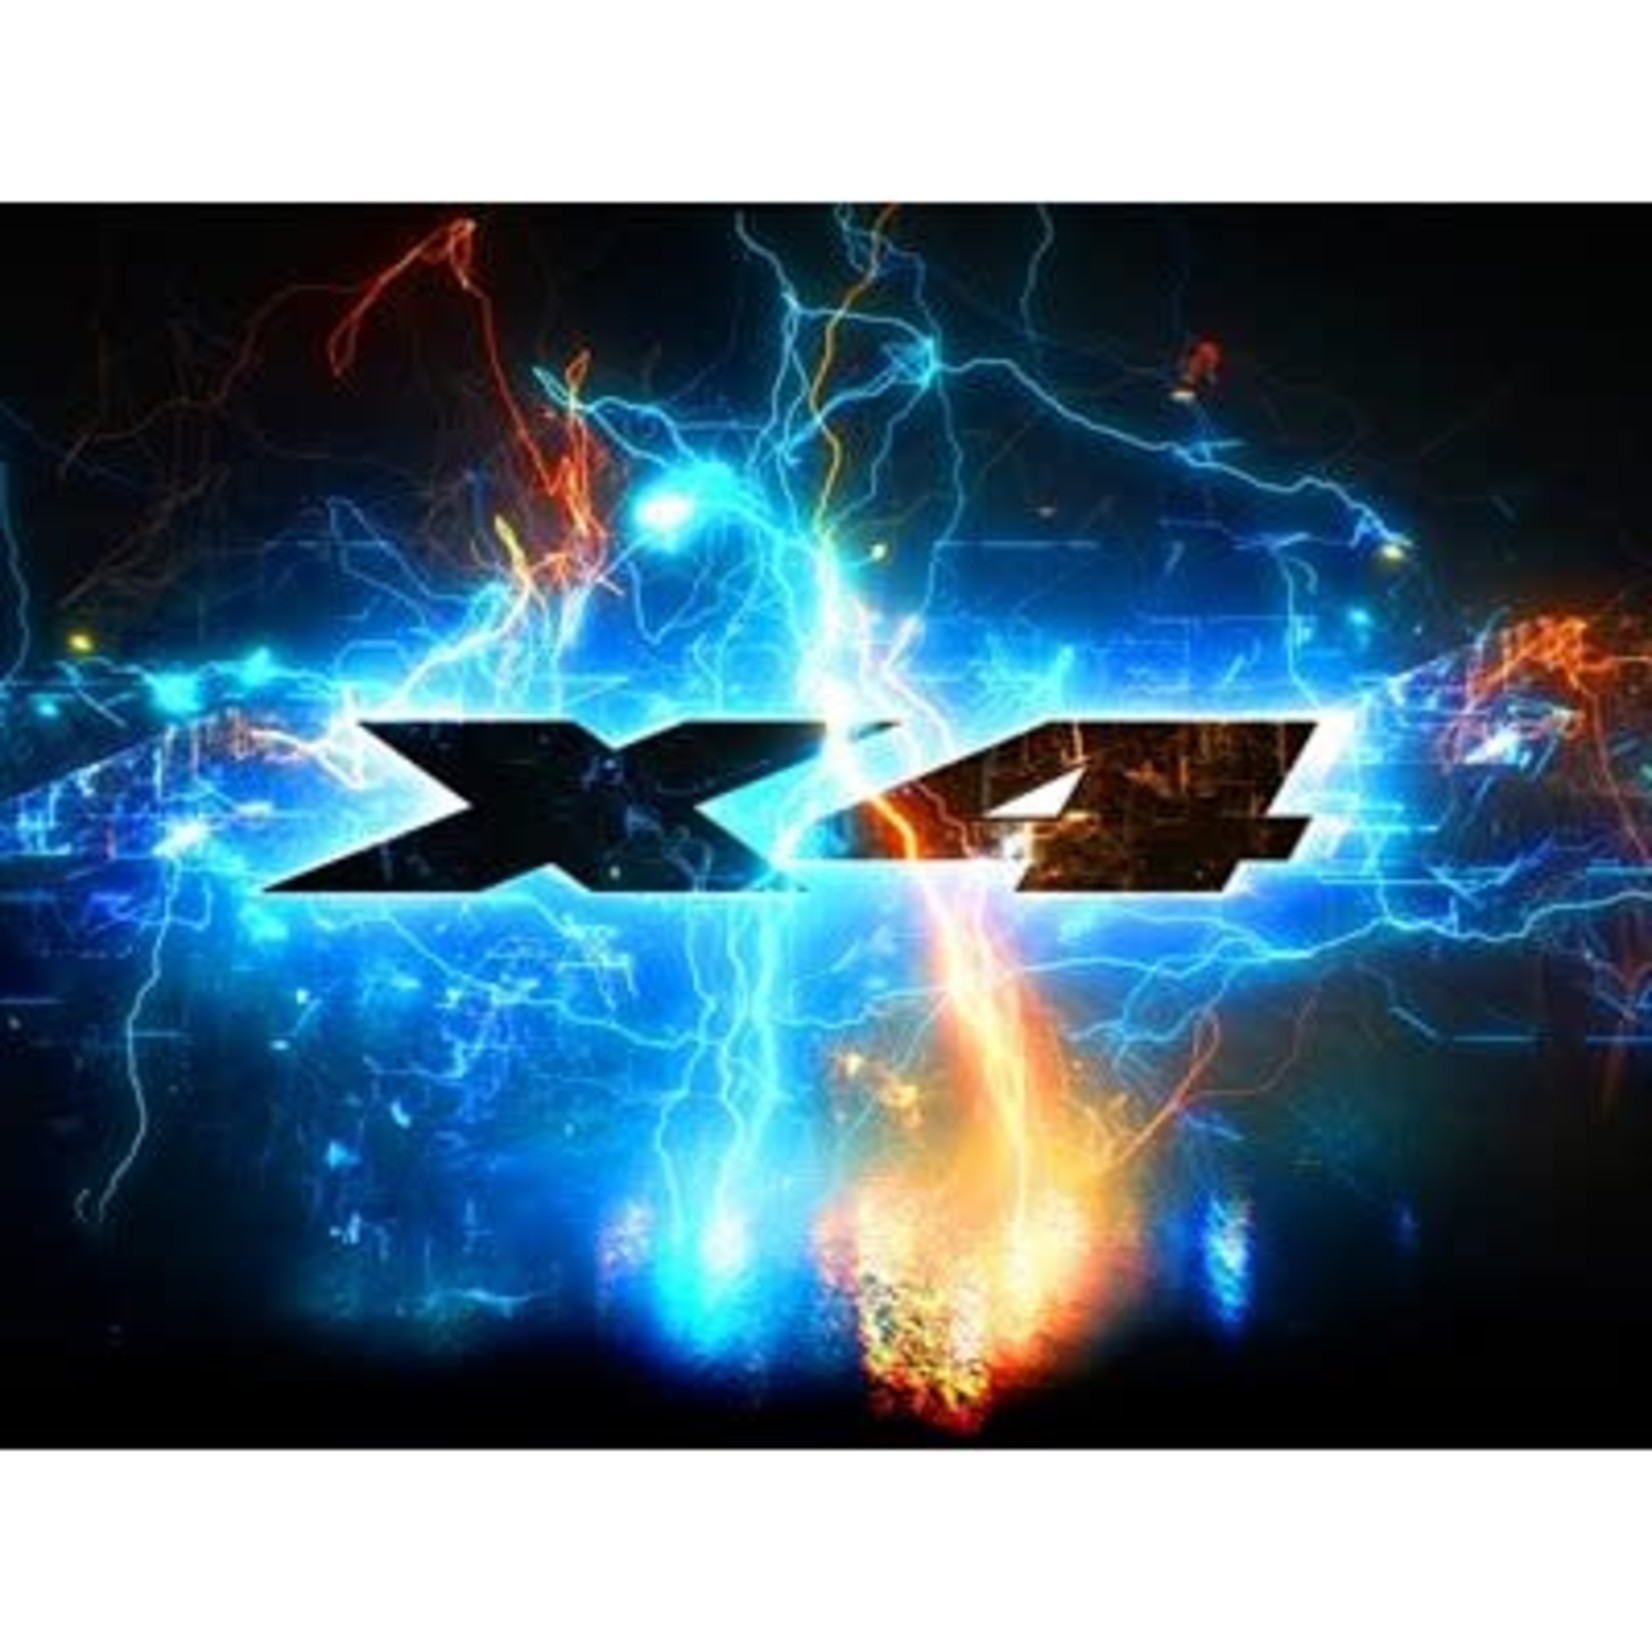 XRAY X4 - 1 / 10 TC - SOLID ALU